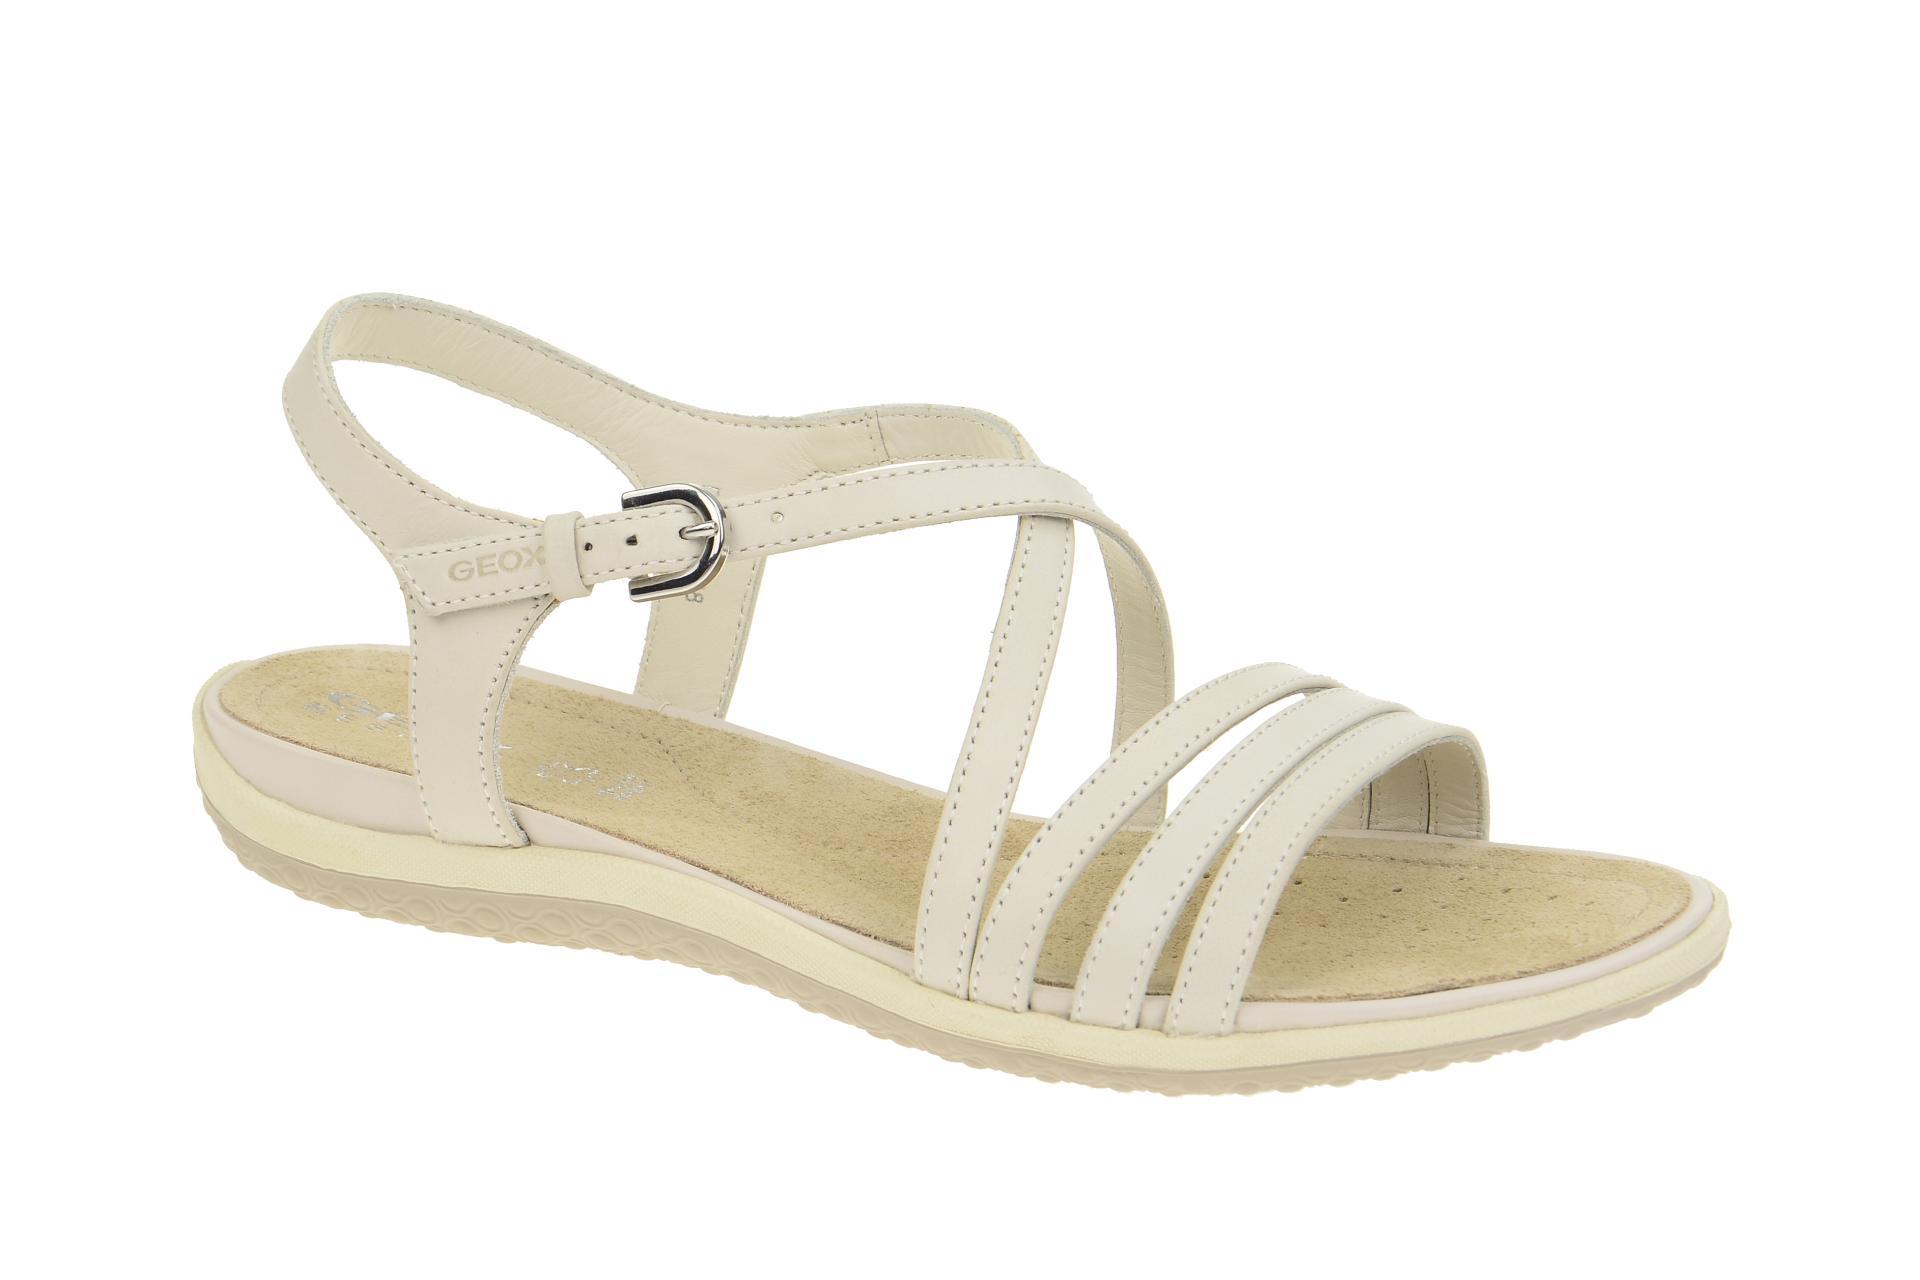 dff5c3723b0f44 Geox Schuhe SAND.VEGA weiß Damen Sandalette Riemchen Sandalen D62R6C 000CL  C1002